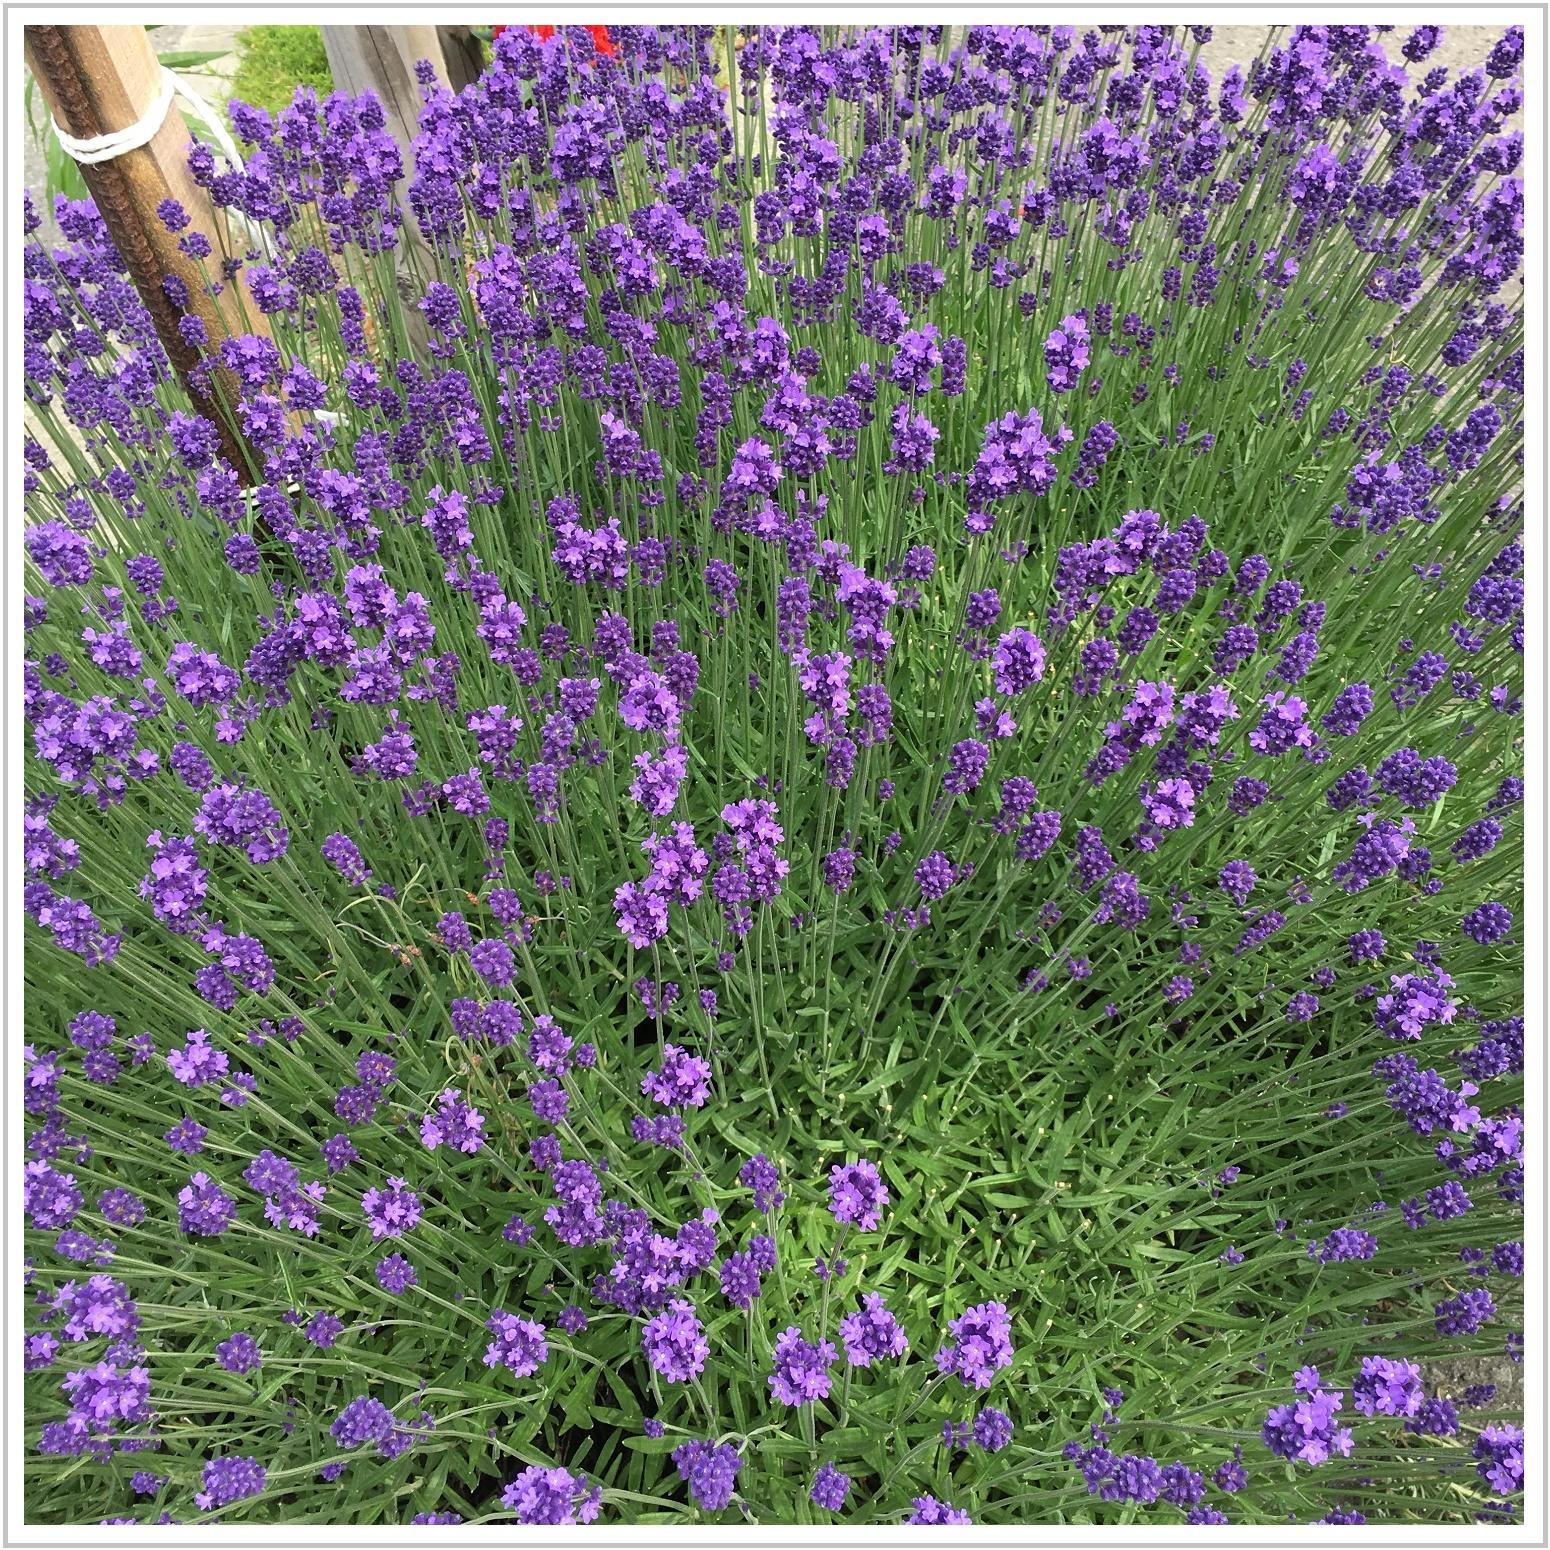 lavender_4_702.jpg